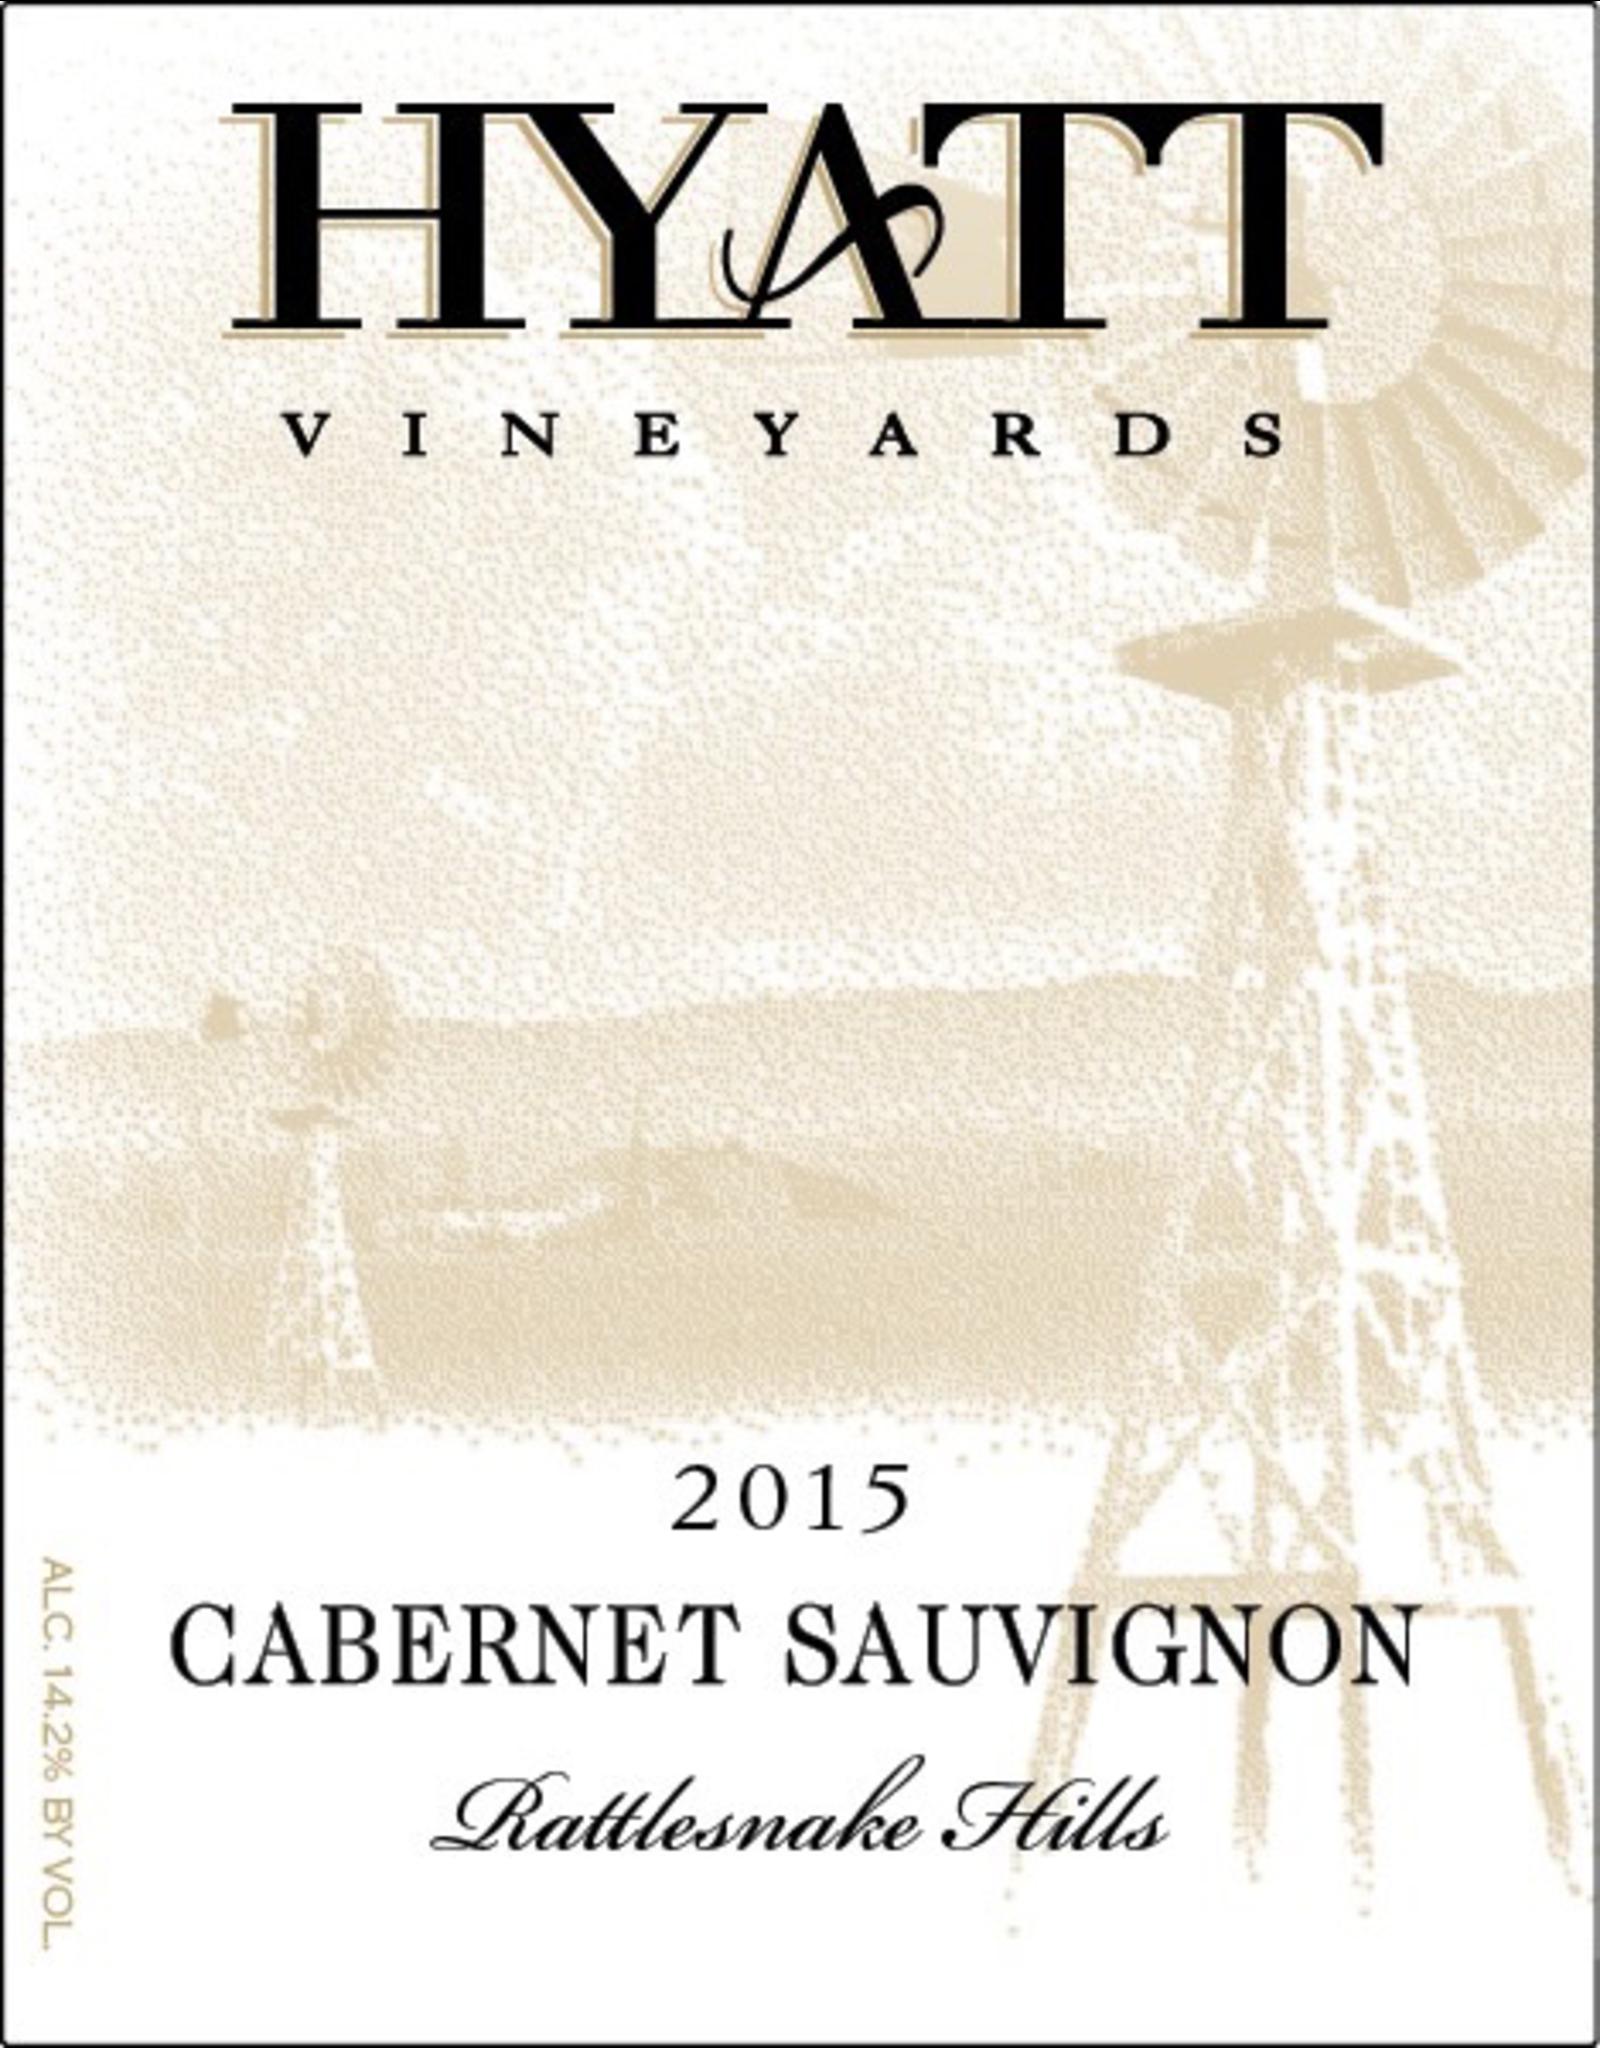 Red Wine 2015, Hyatt Vineyards Rattlesnake Hills, Cabernet Sauvignon, Yakima Valley, Columbia Valley, Washington, 14.2% Alc, CTnr, TW90